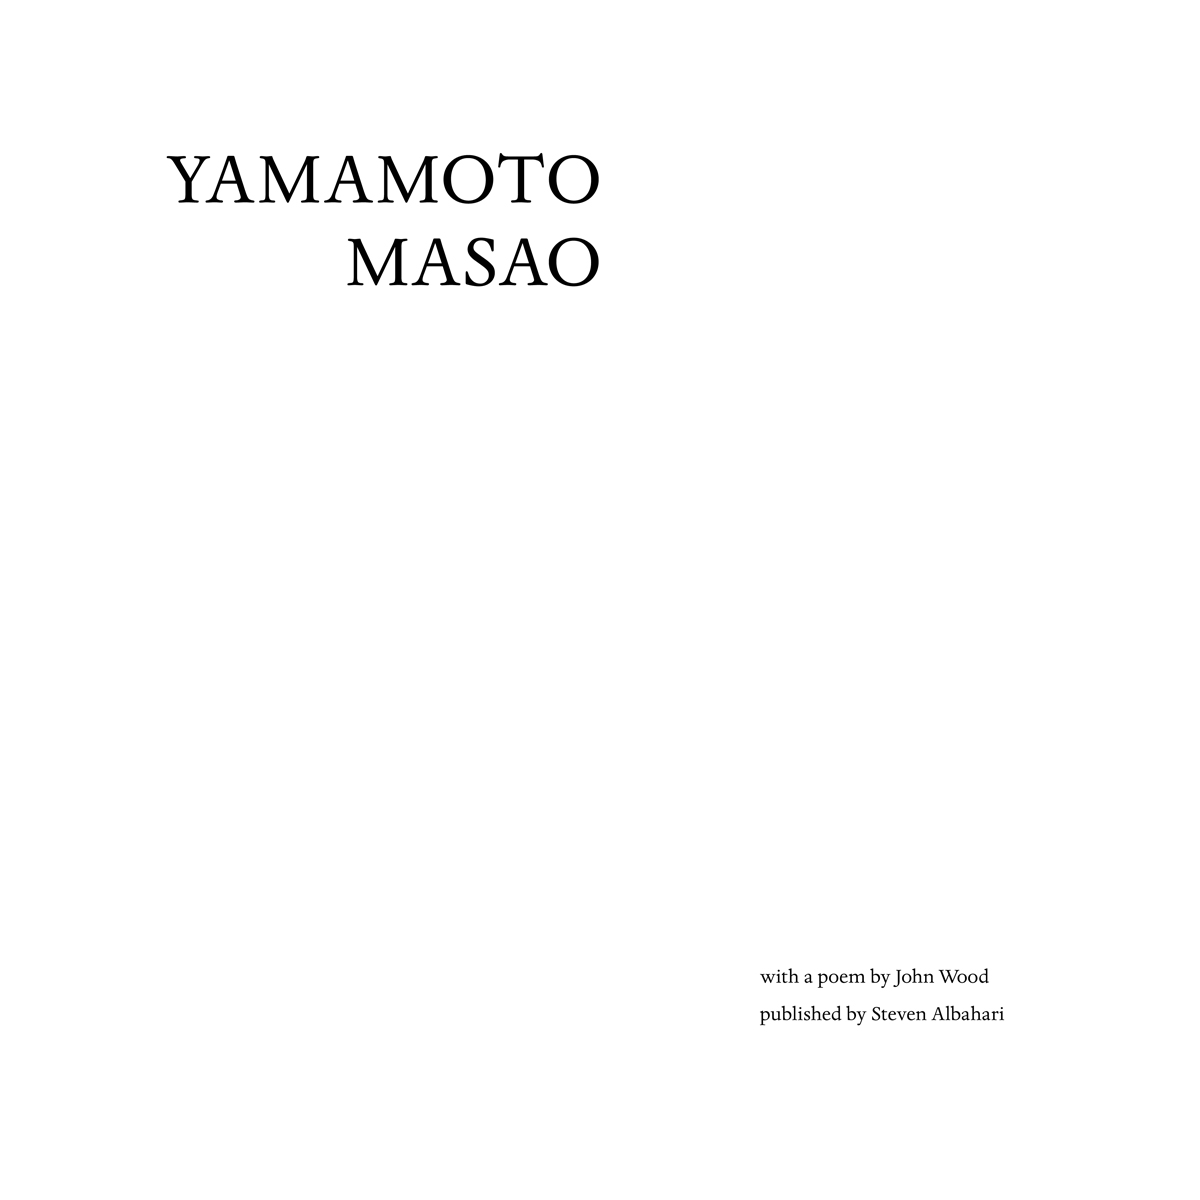 John Wood, Yamamoto Masao